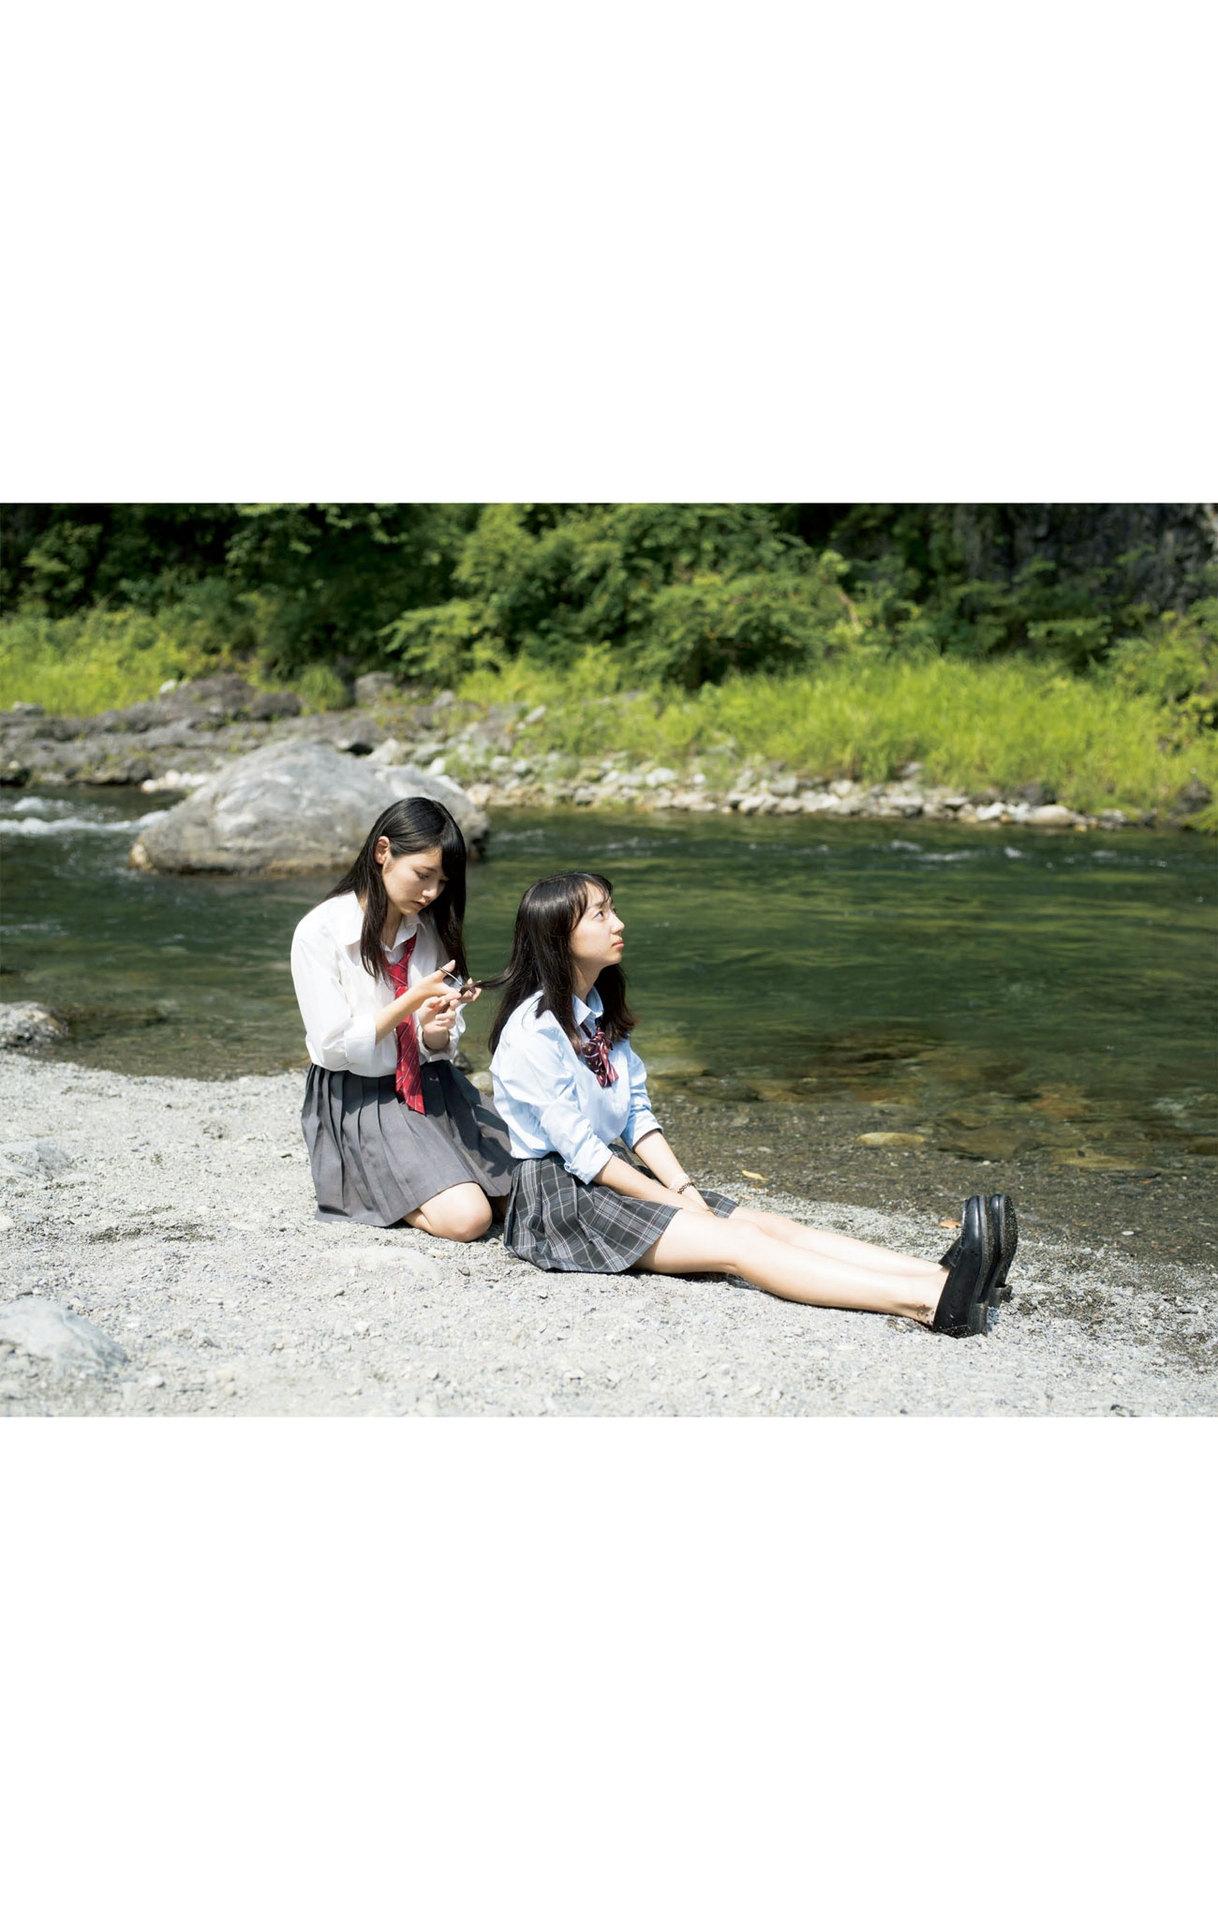 Summer Vacation Uniform After School Youth Bikini073